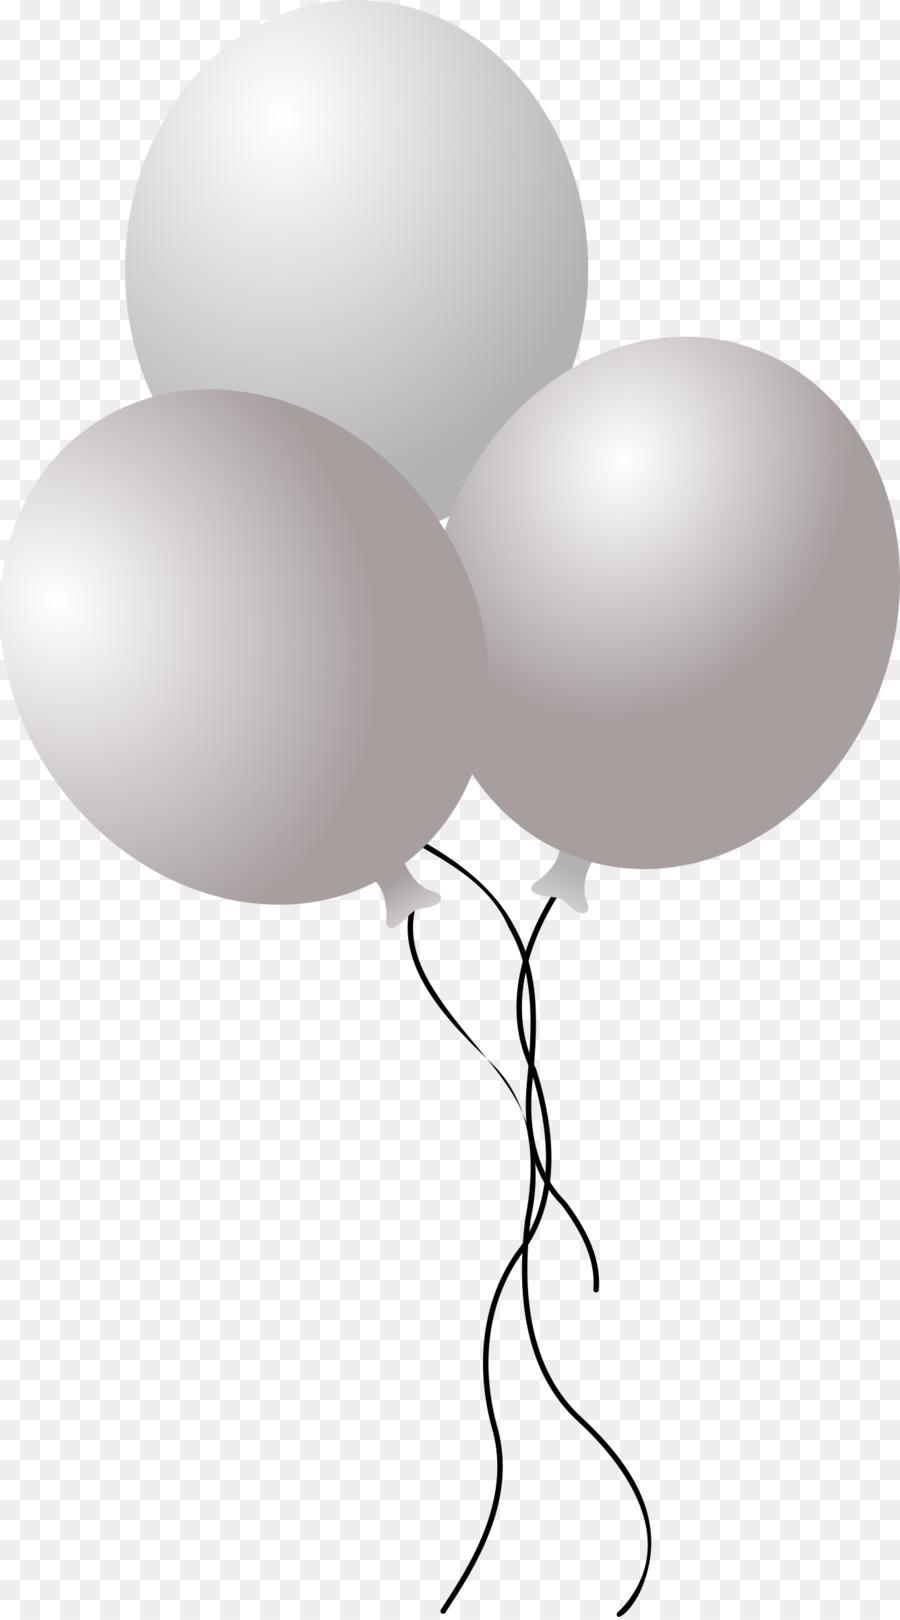 White Balloon clipart.